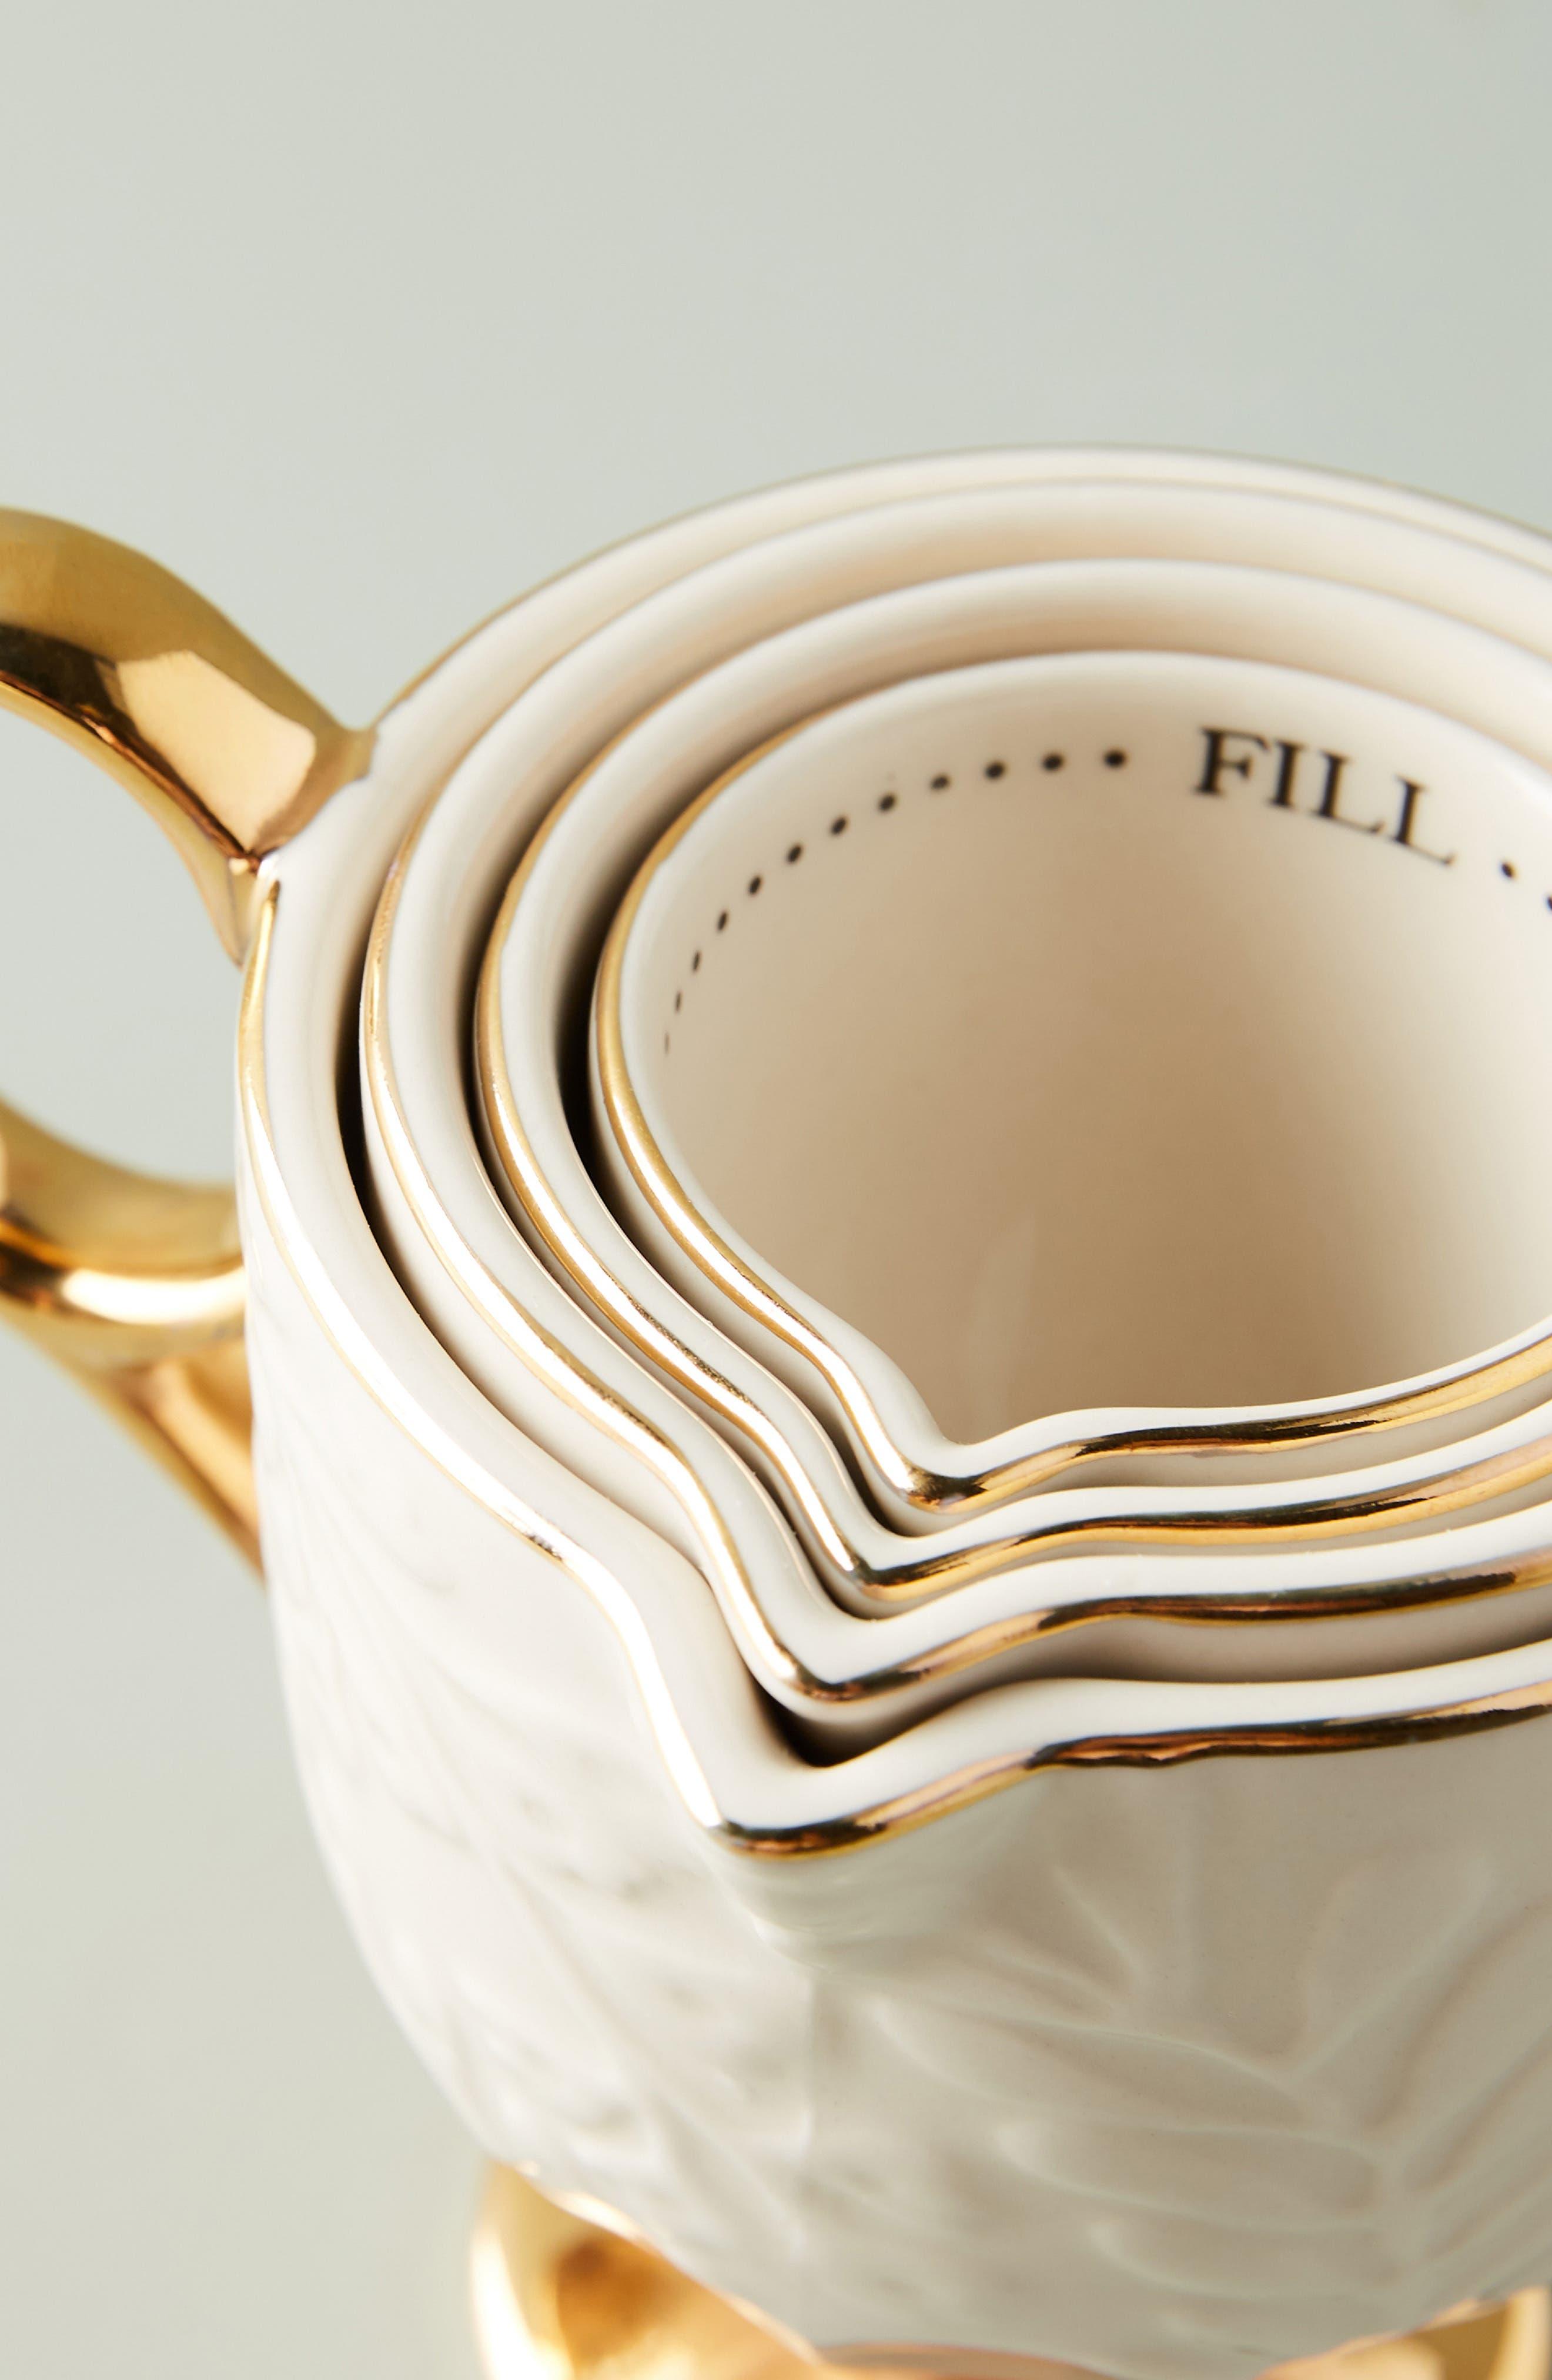 Dorina Set of 4 Measuring Cups,                             Alternate thumbnail 2, color,                             710